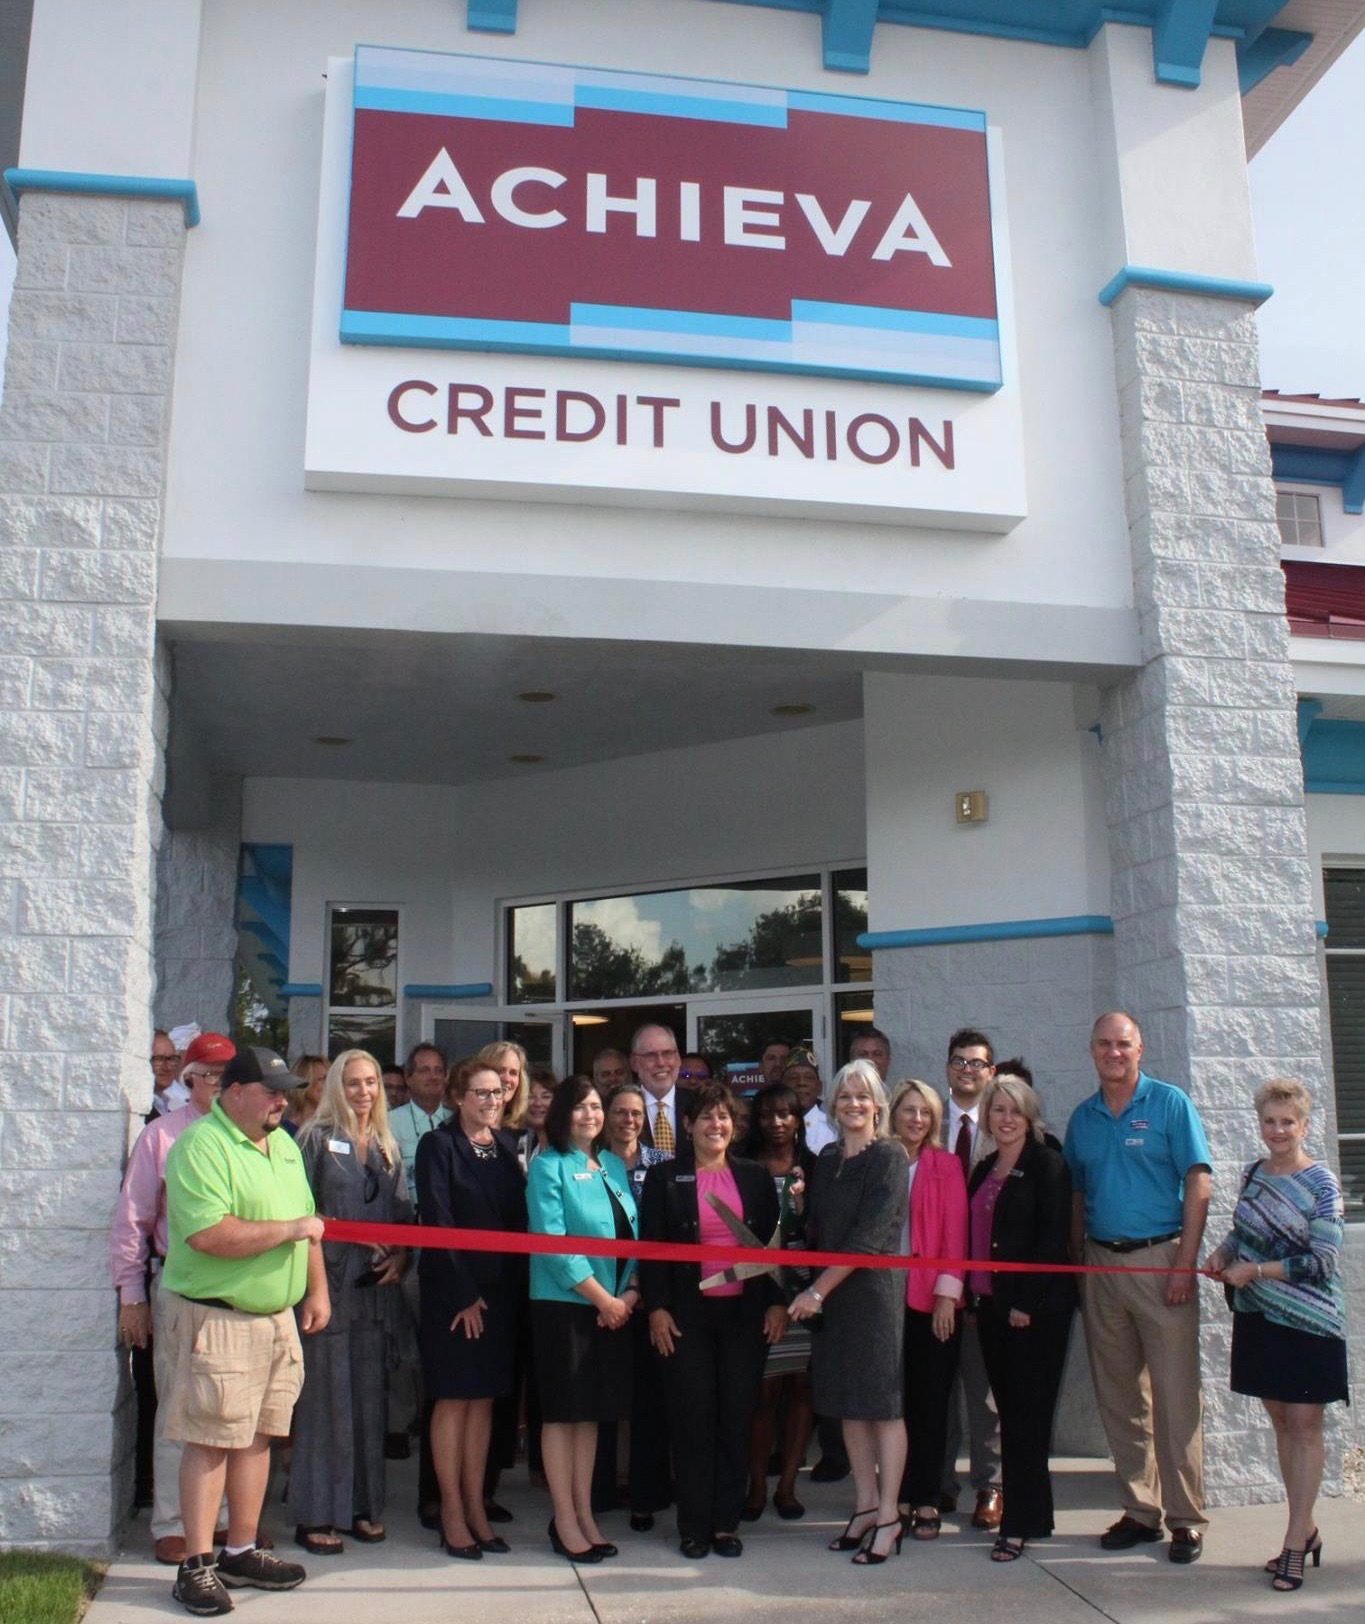 achieva credit union locations pinellas county